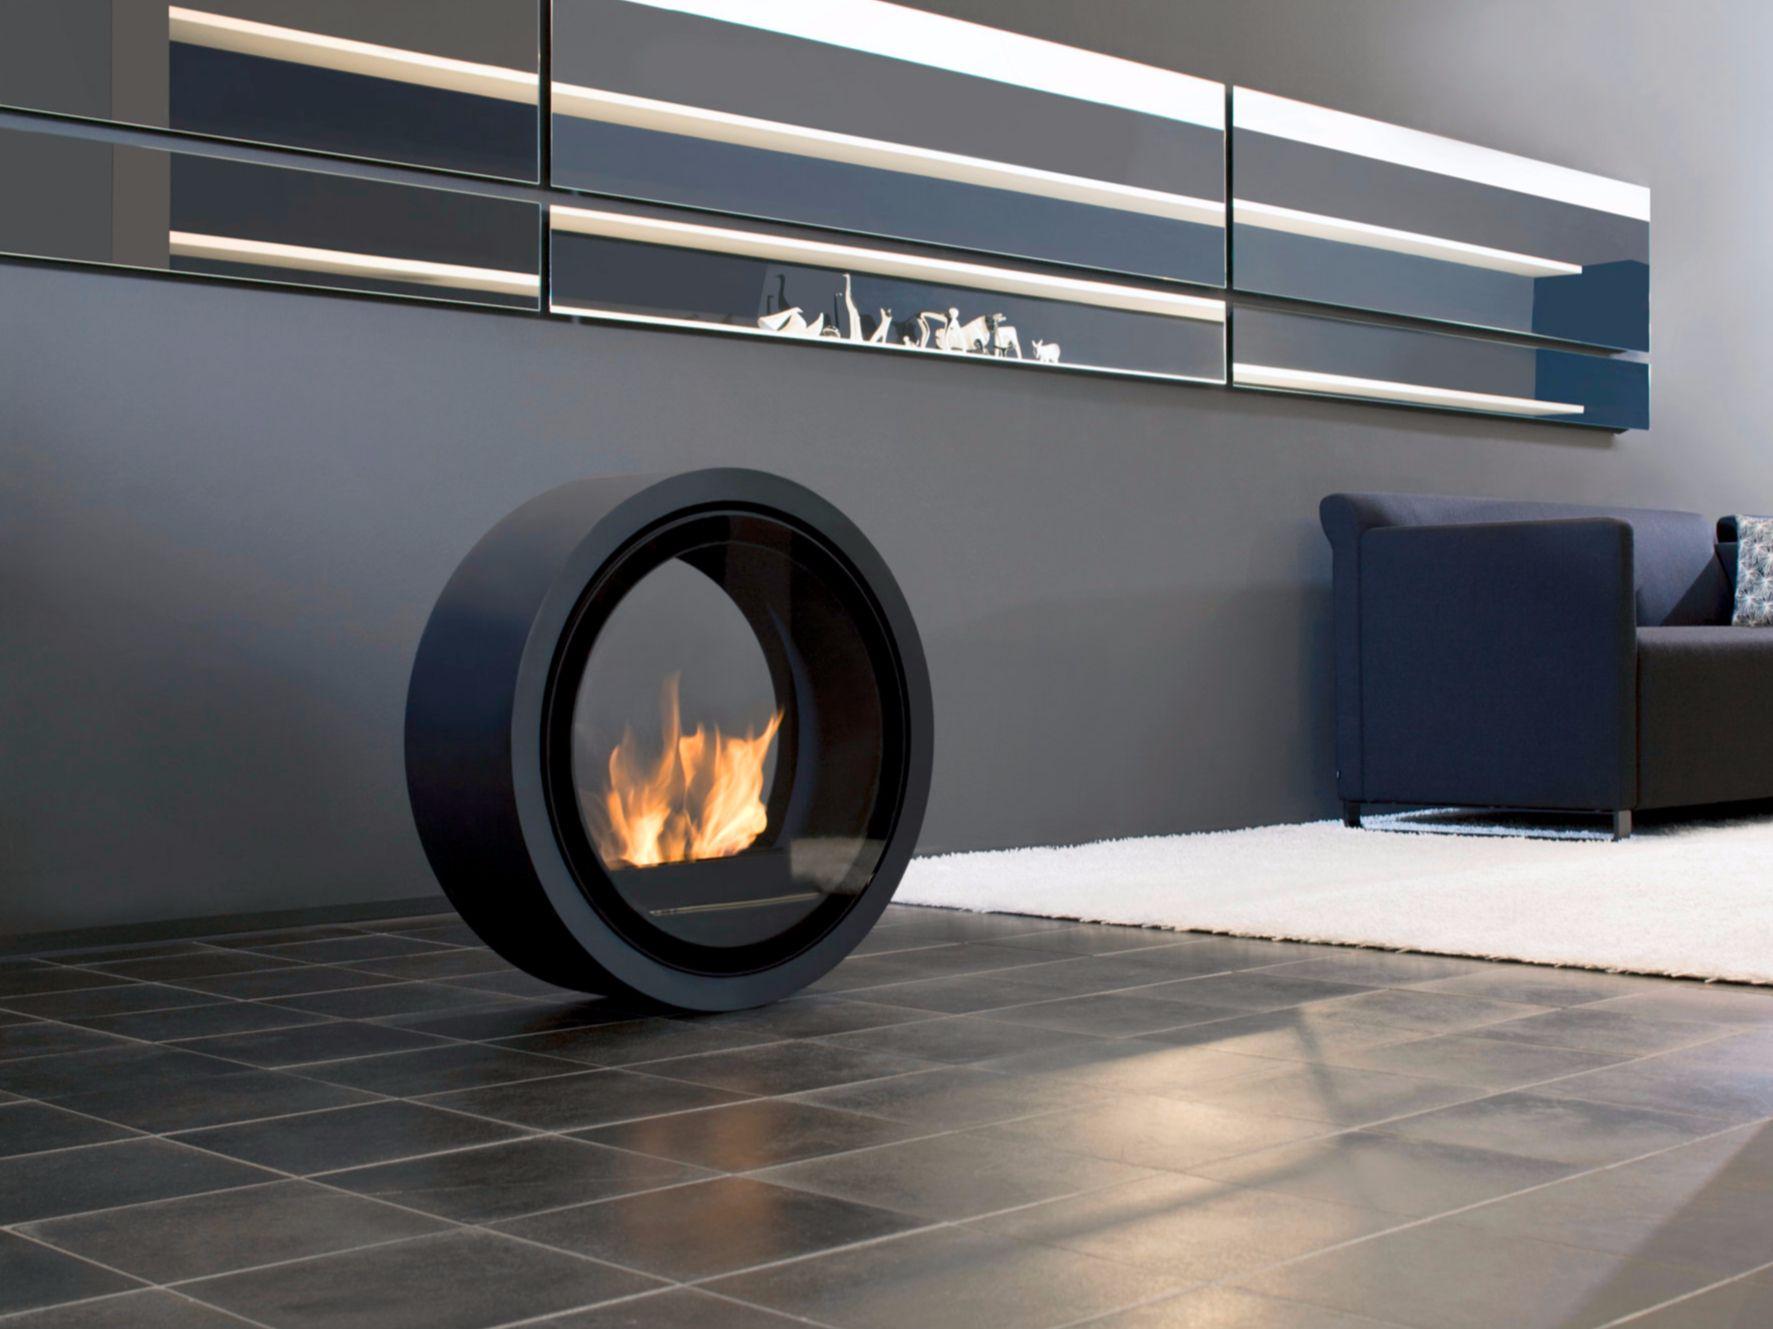 Cheminee Sur Pied Au Bioethanol Avec Vitre Panoramique Roll Fire By Conmoto By Lions At Work Design Sieger Design Decoration Maison Chauffage Terrasse Design